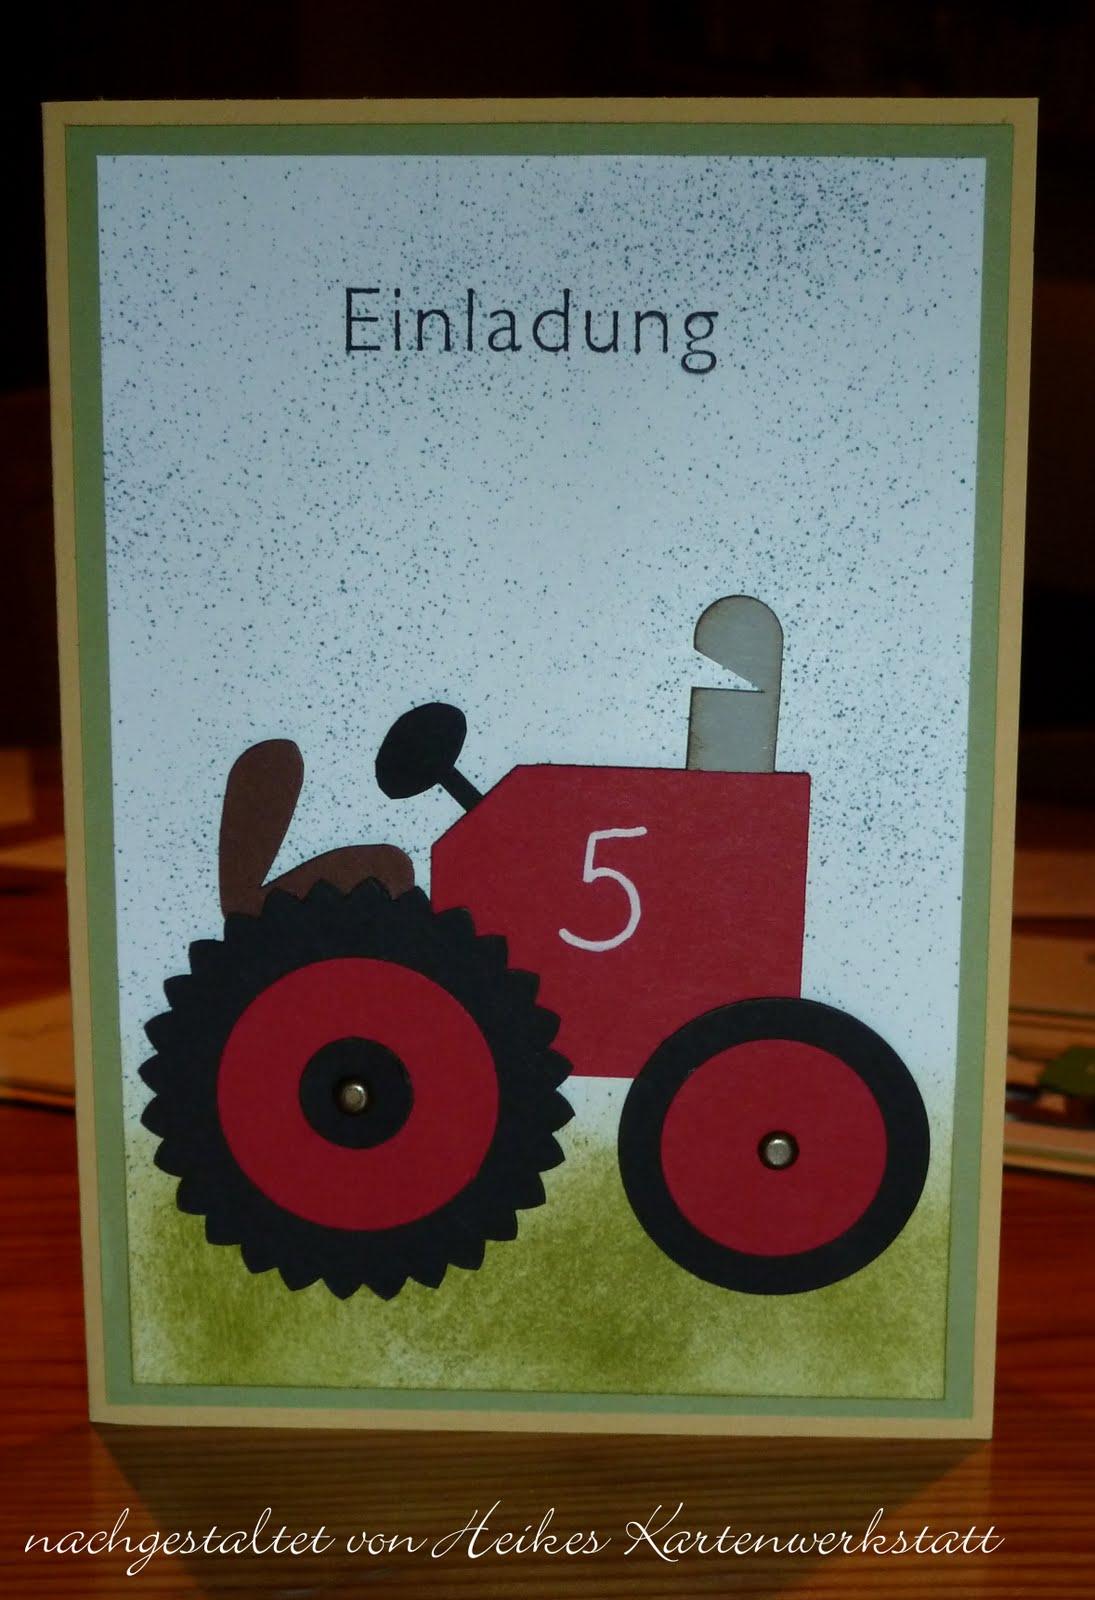 Heikes Kartenwerkstatt: Mai 2011